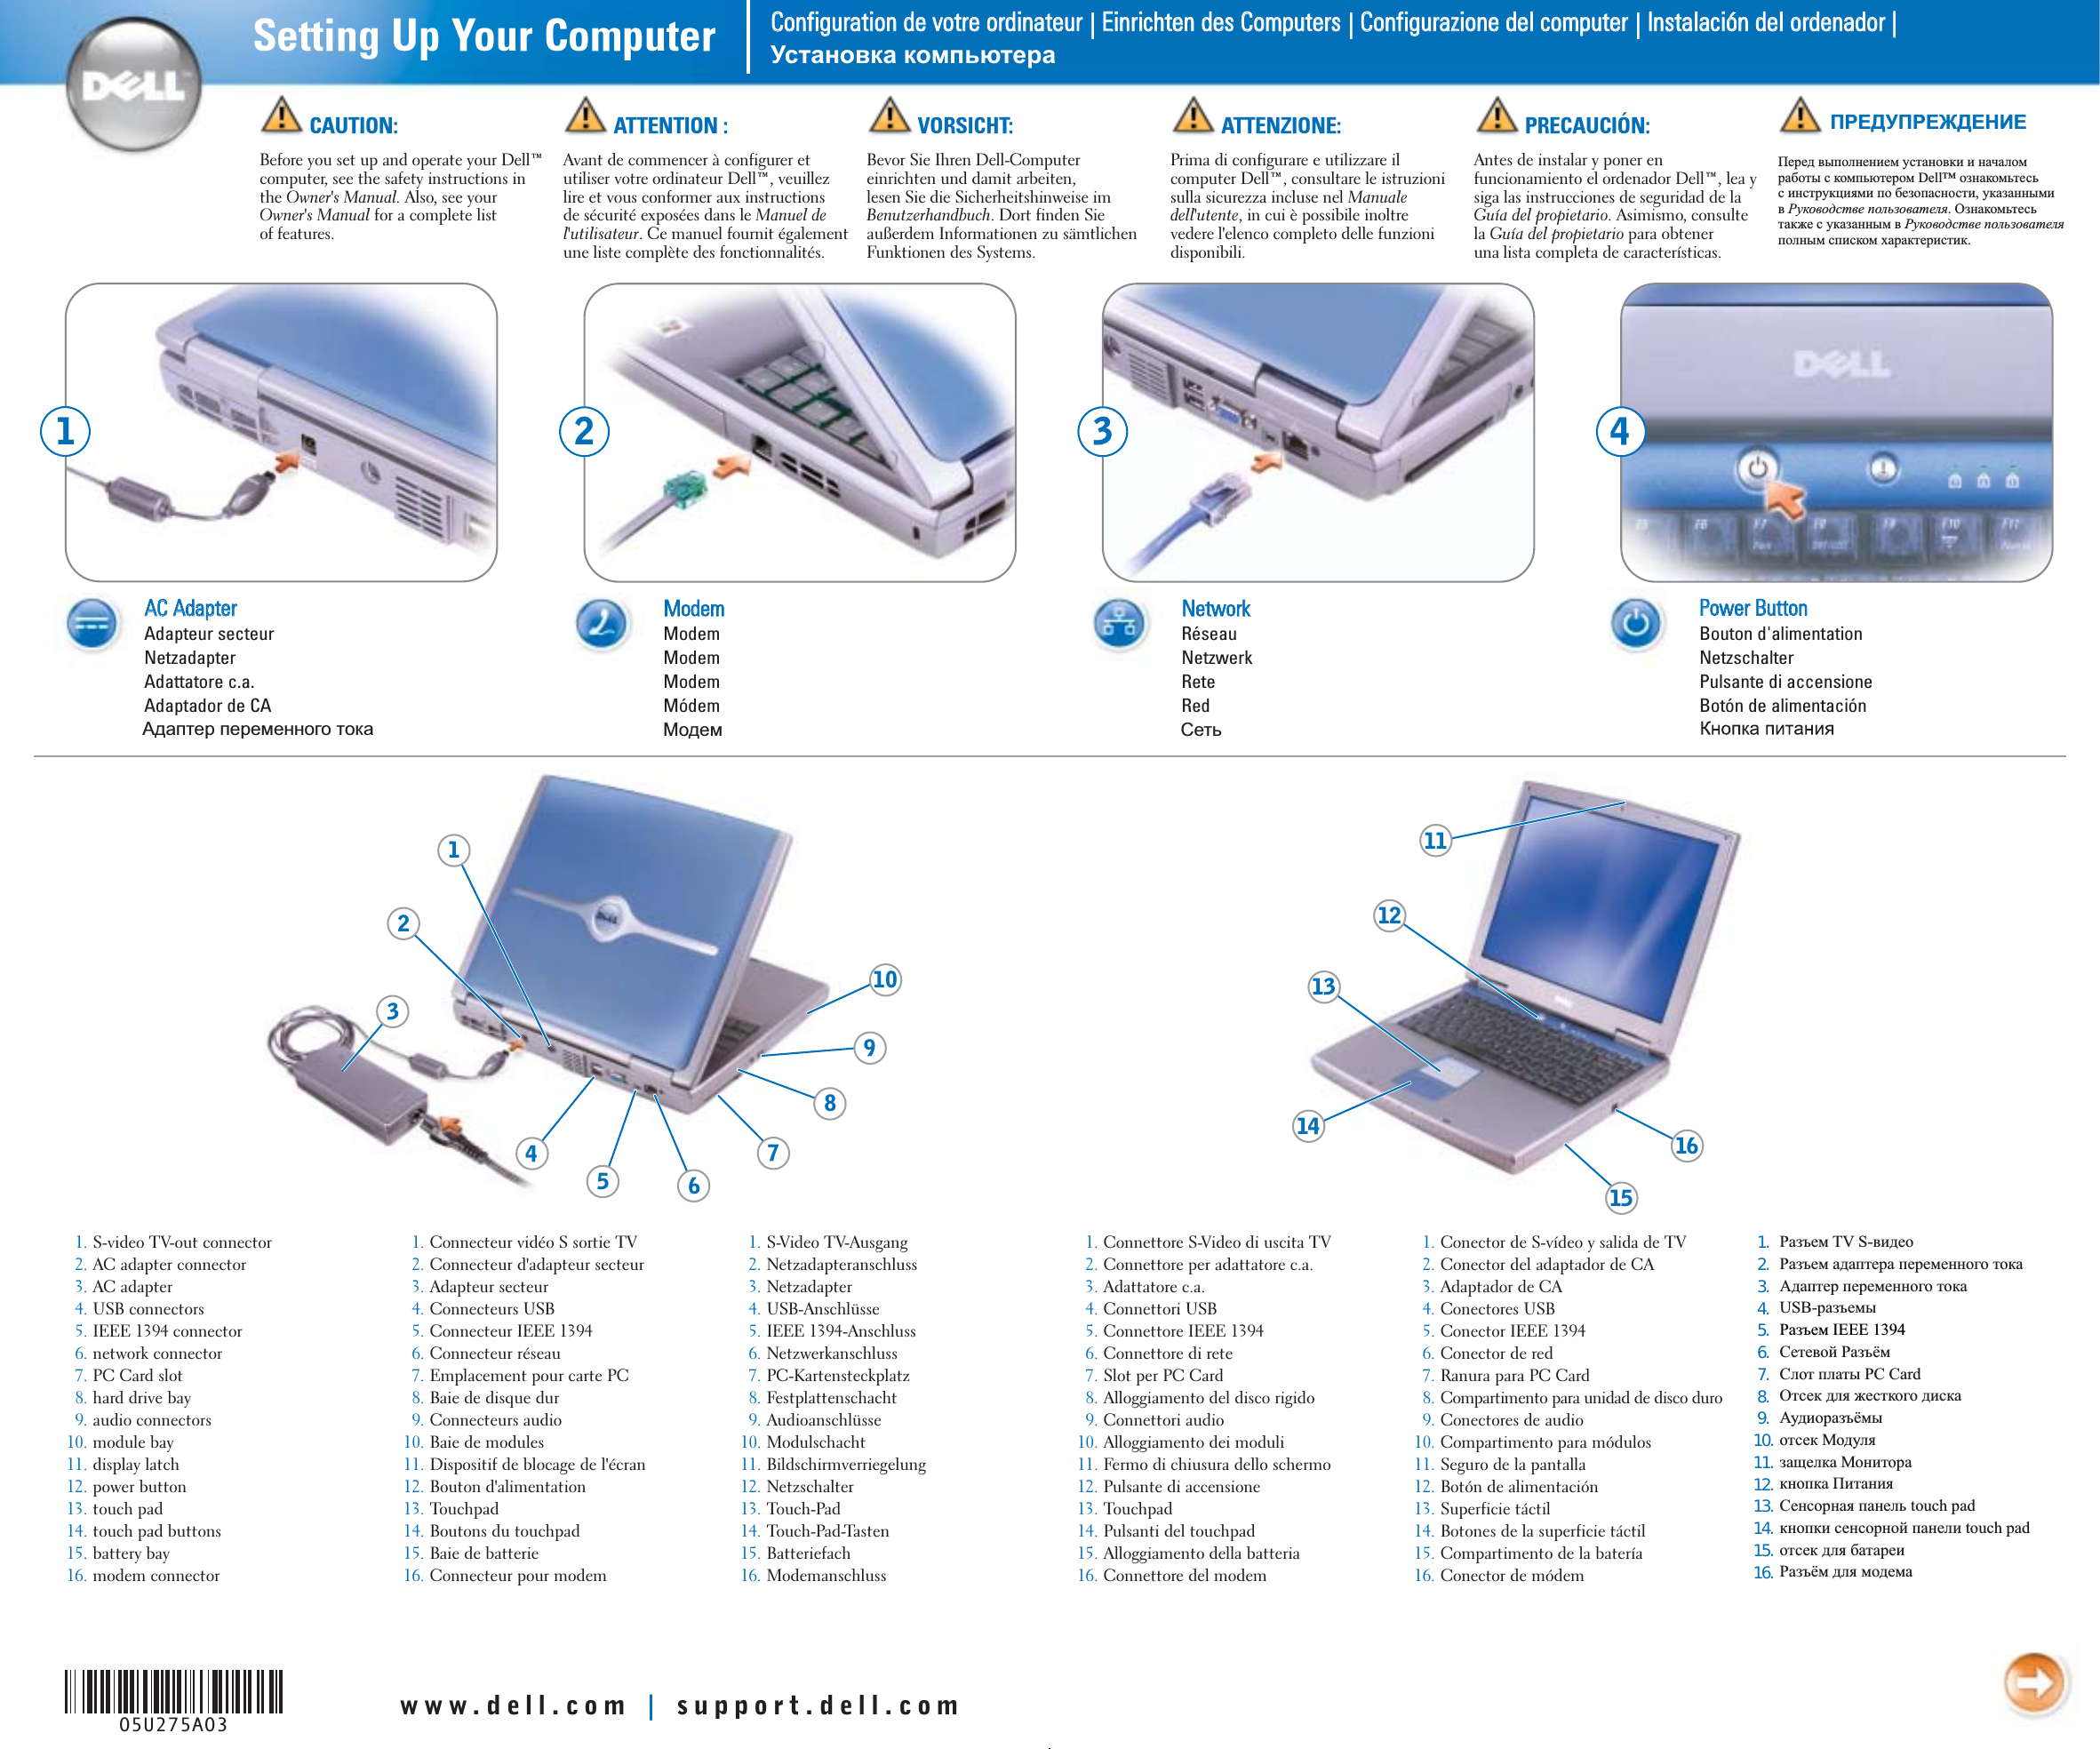 dell inspiron 5100 setup diagram rh usermanual wiki dell dimension 5100 manual dell inspiron 5100 service manual pdf